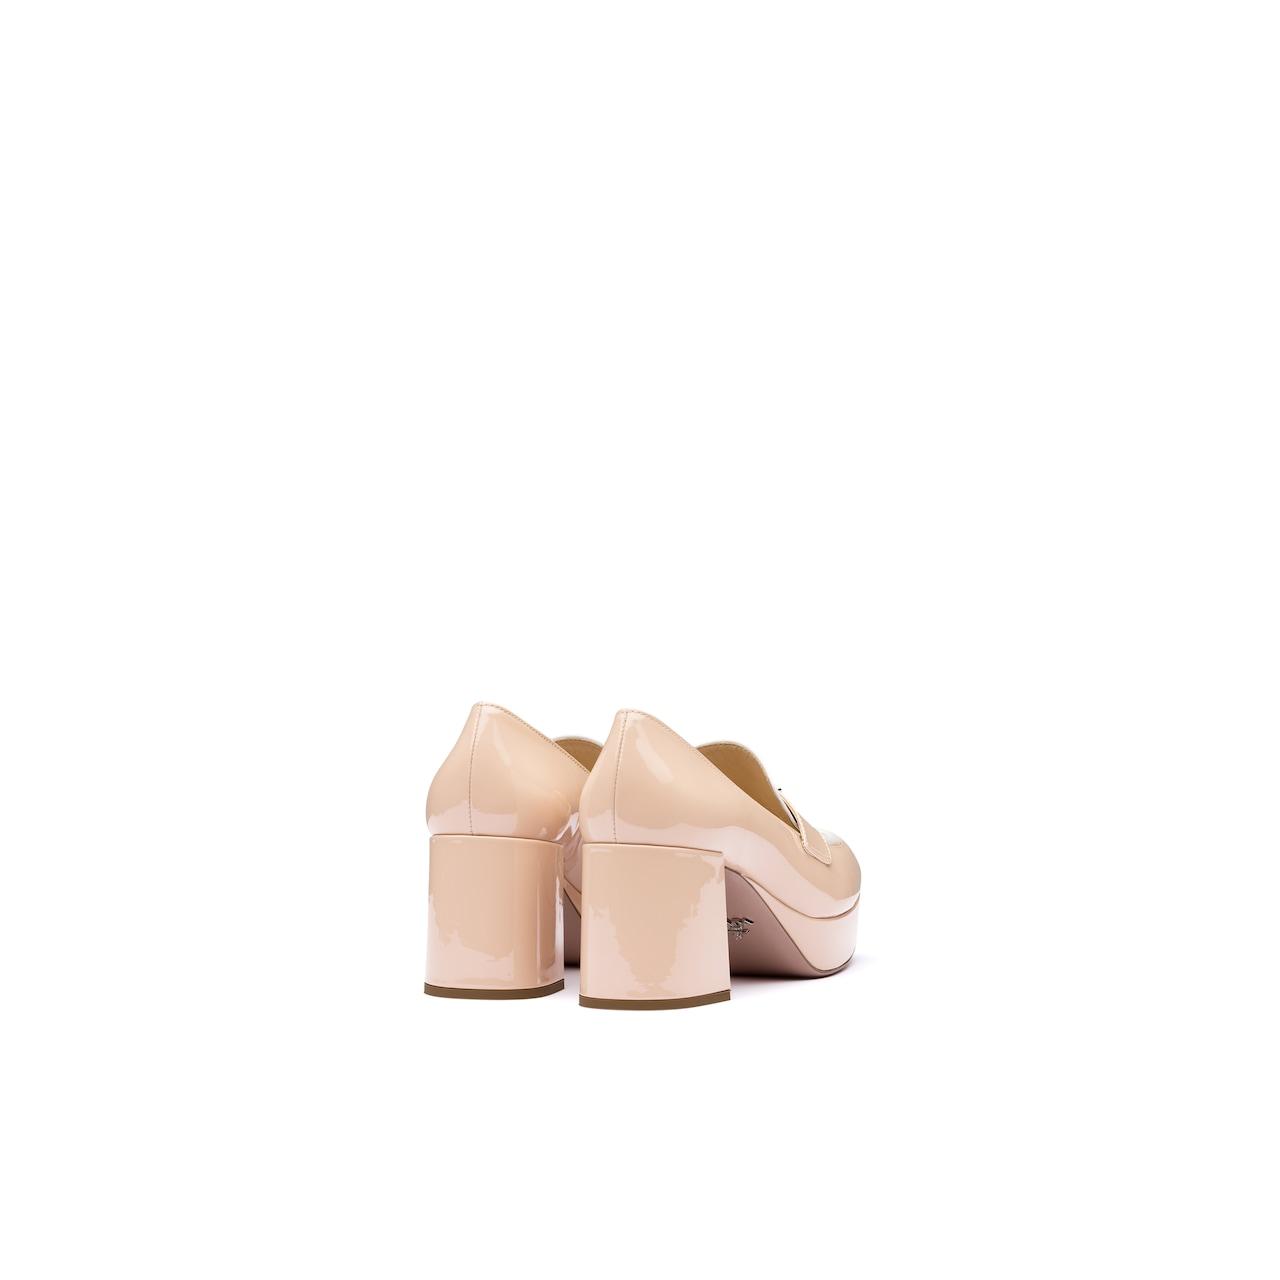 Prada Two-tone patent leather platform loafers 5